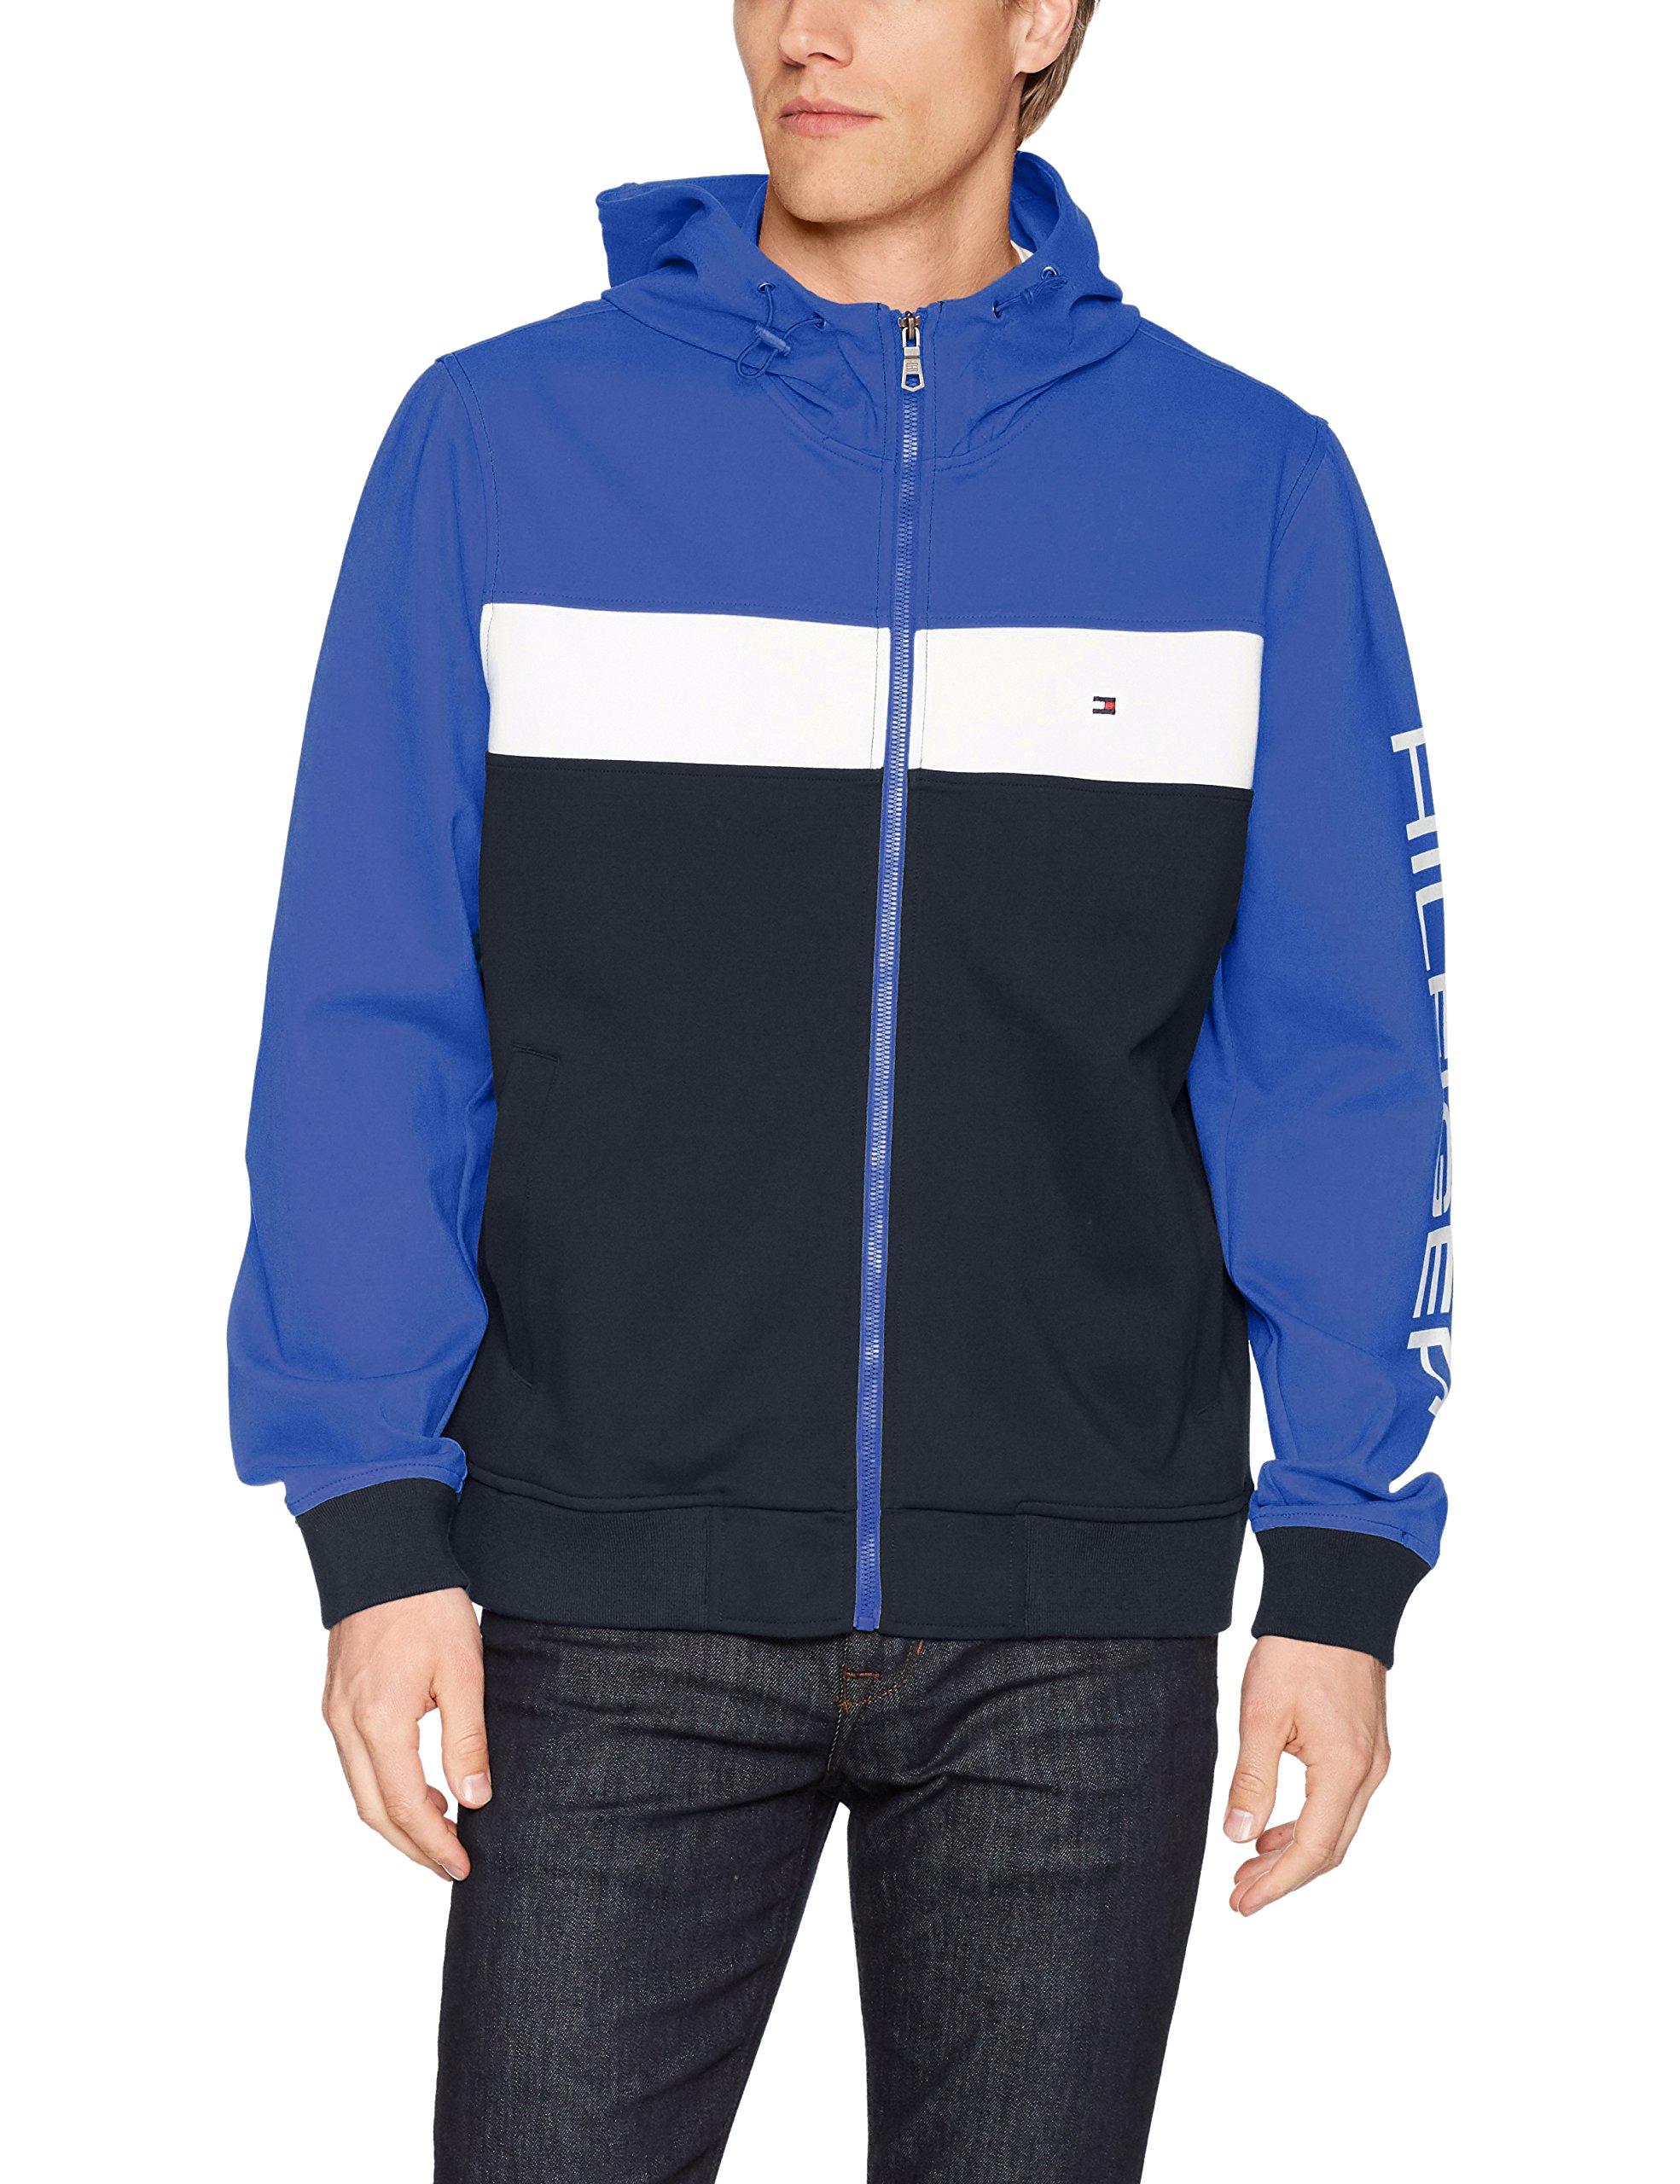 Tommy Hilfiger Men's Retro Colorblocked Hooded Track Jacket, Royal Blue/White/Navy, Large